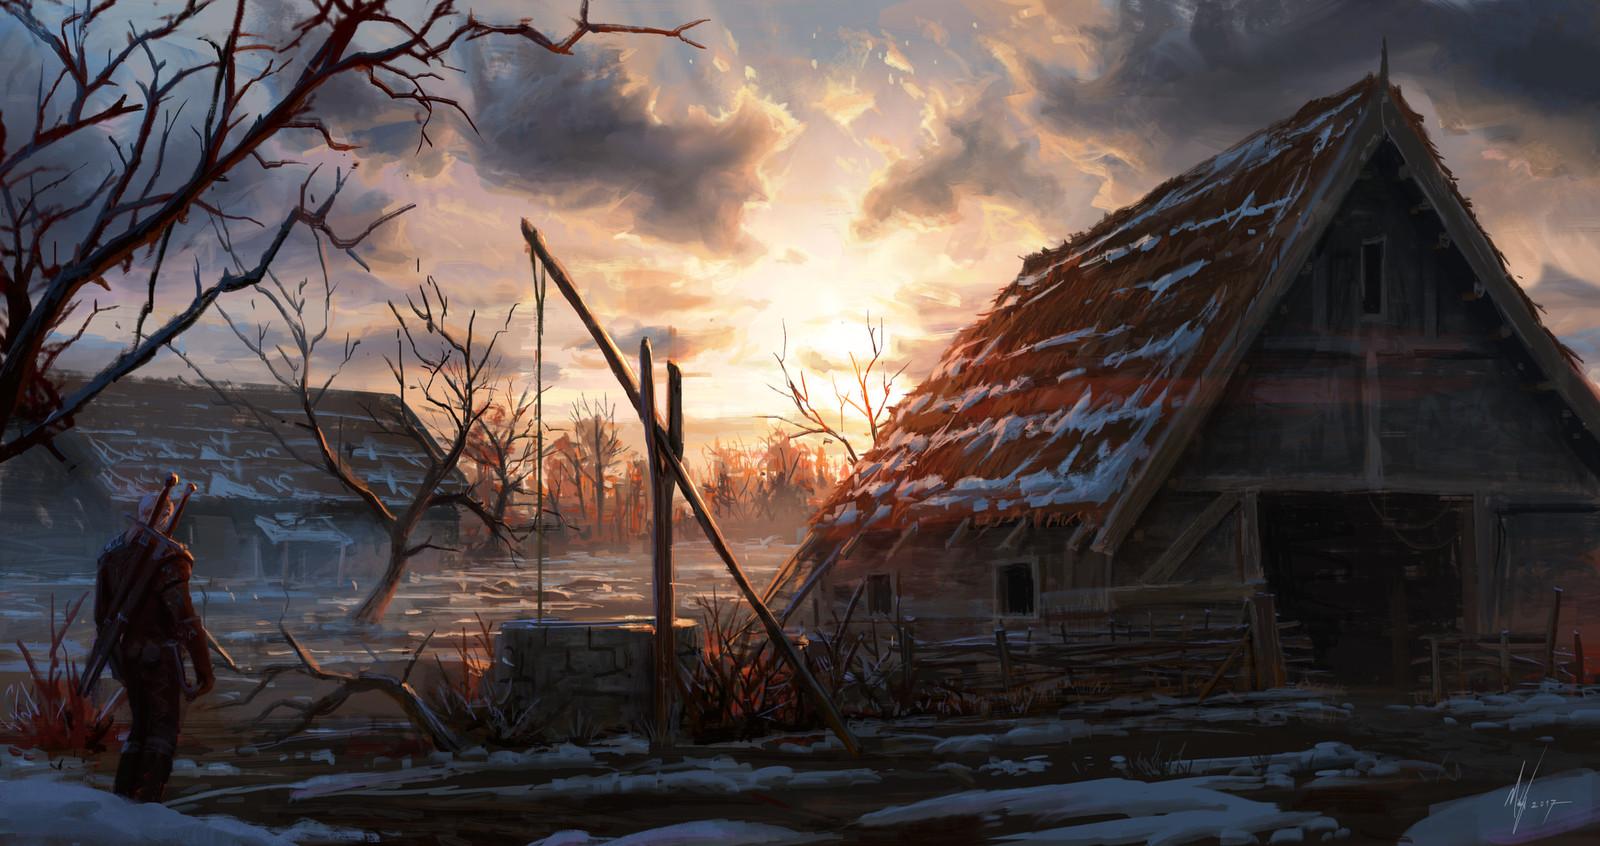 Геральт - Witcher, the Арт, Персонаж